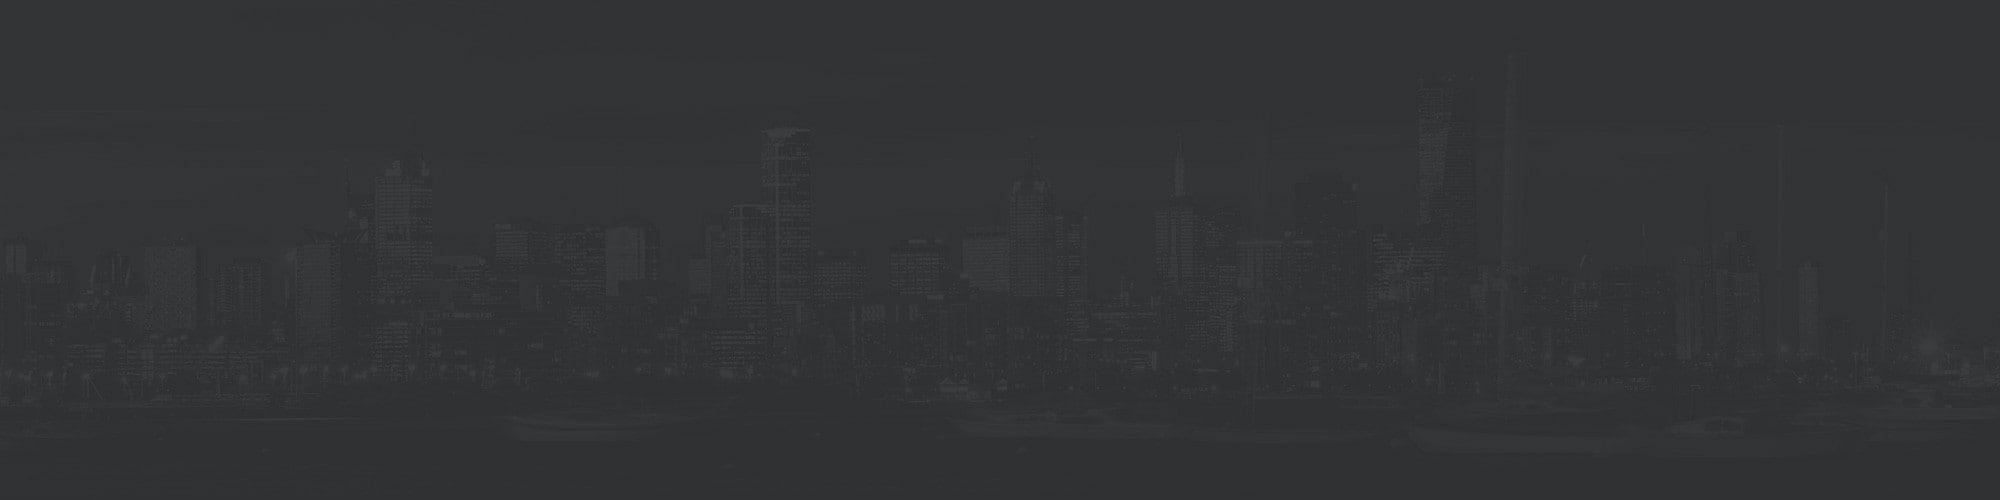 SAS Forum Australia & NZ Location Background Gray - Melbourne